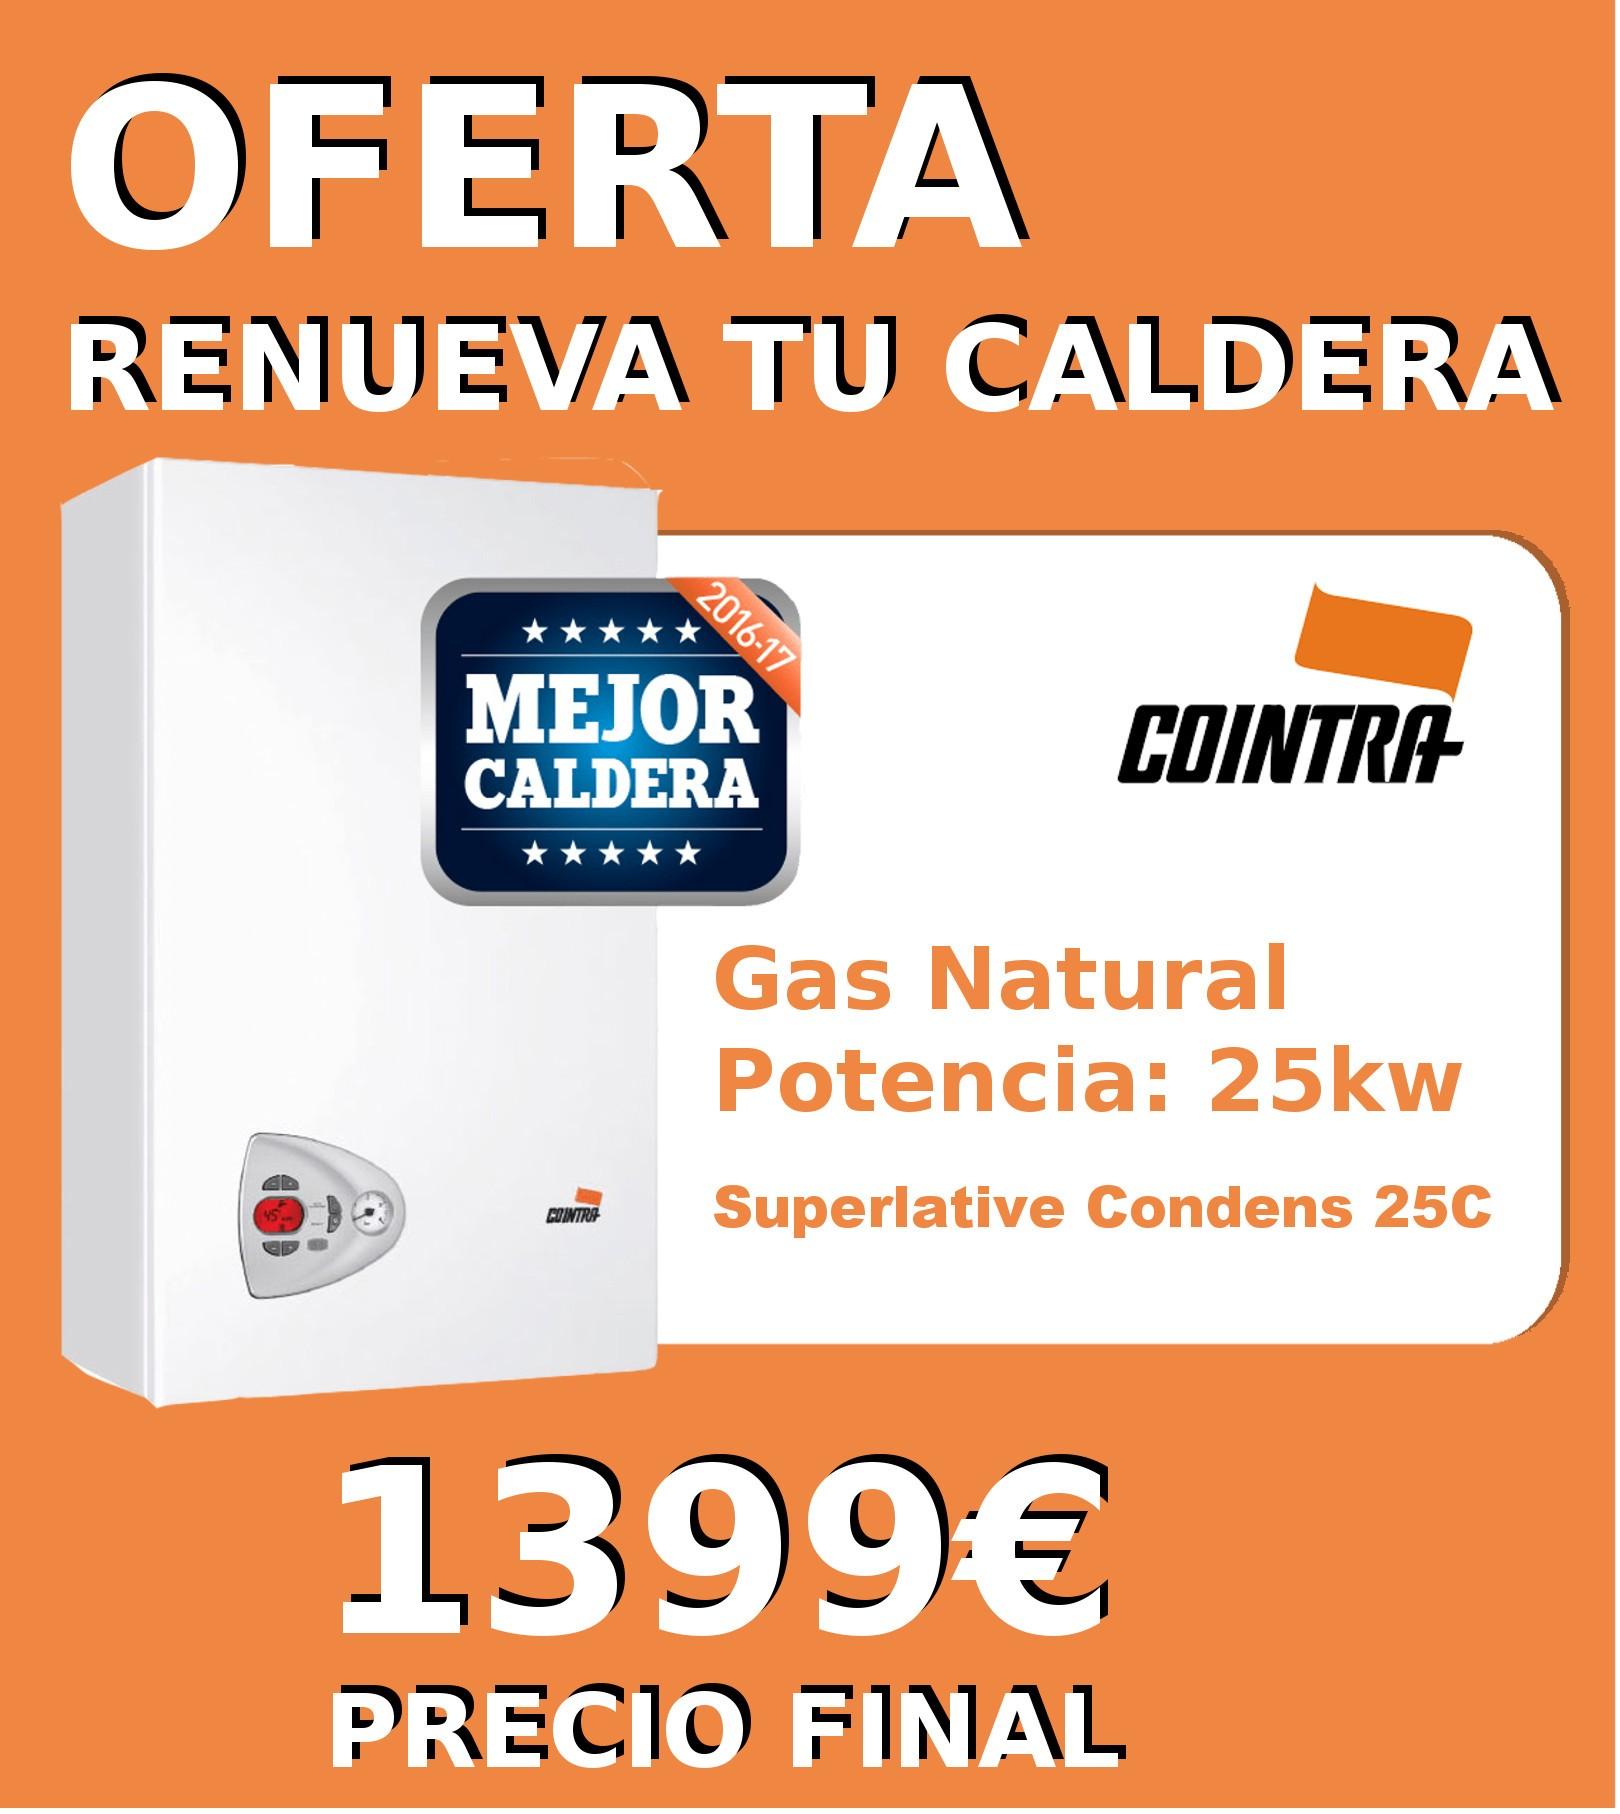 Que caldera de gas natural comprar trendy cool top - Calderas gas natural precios ...